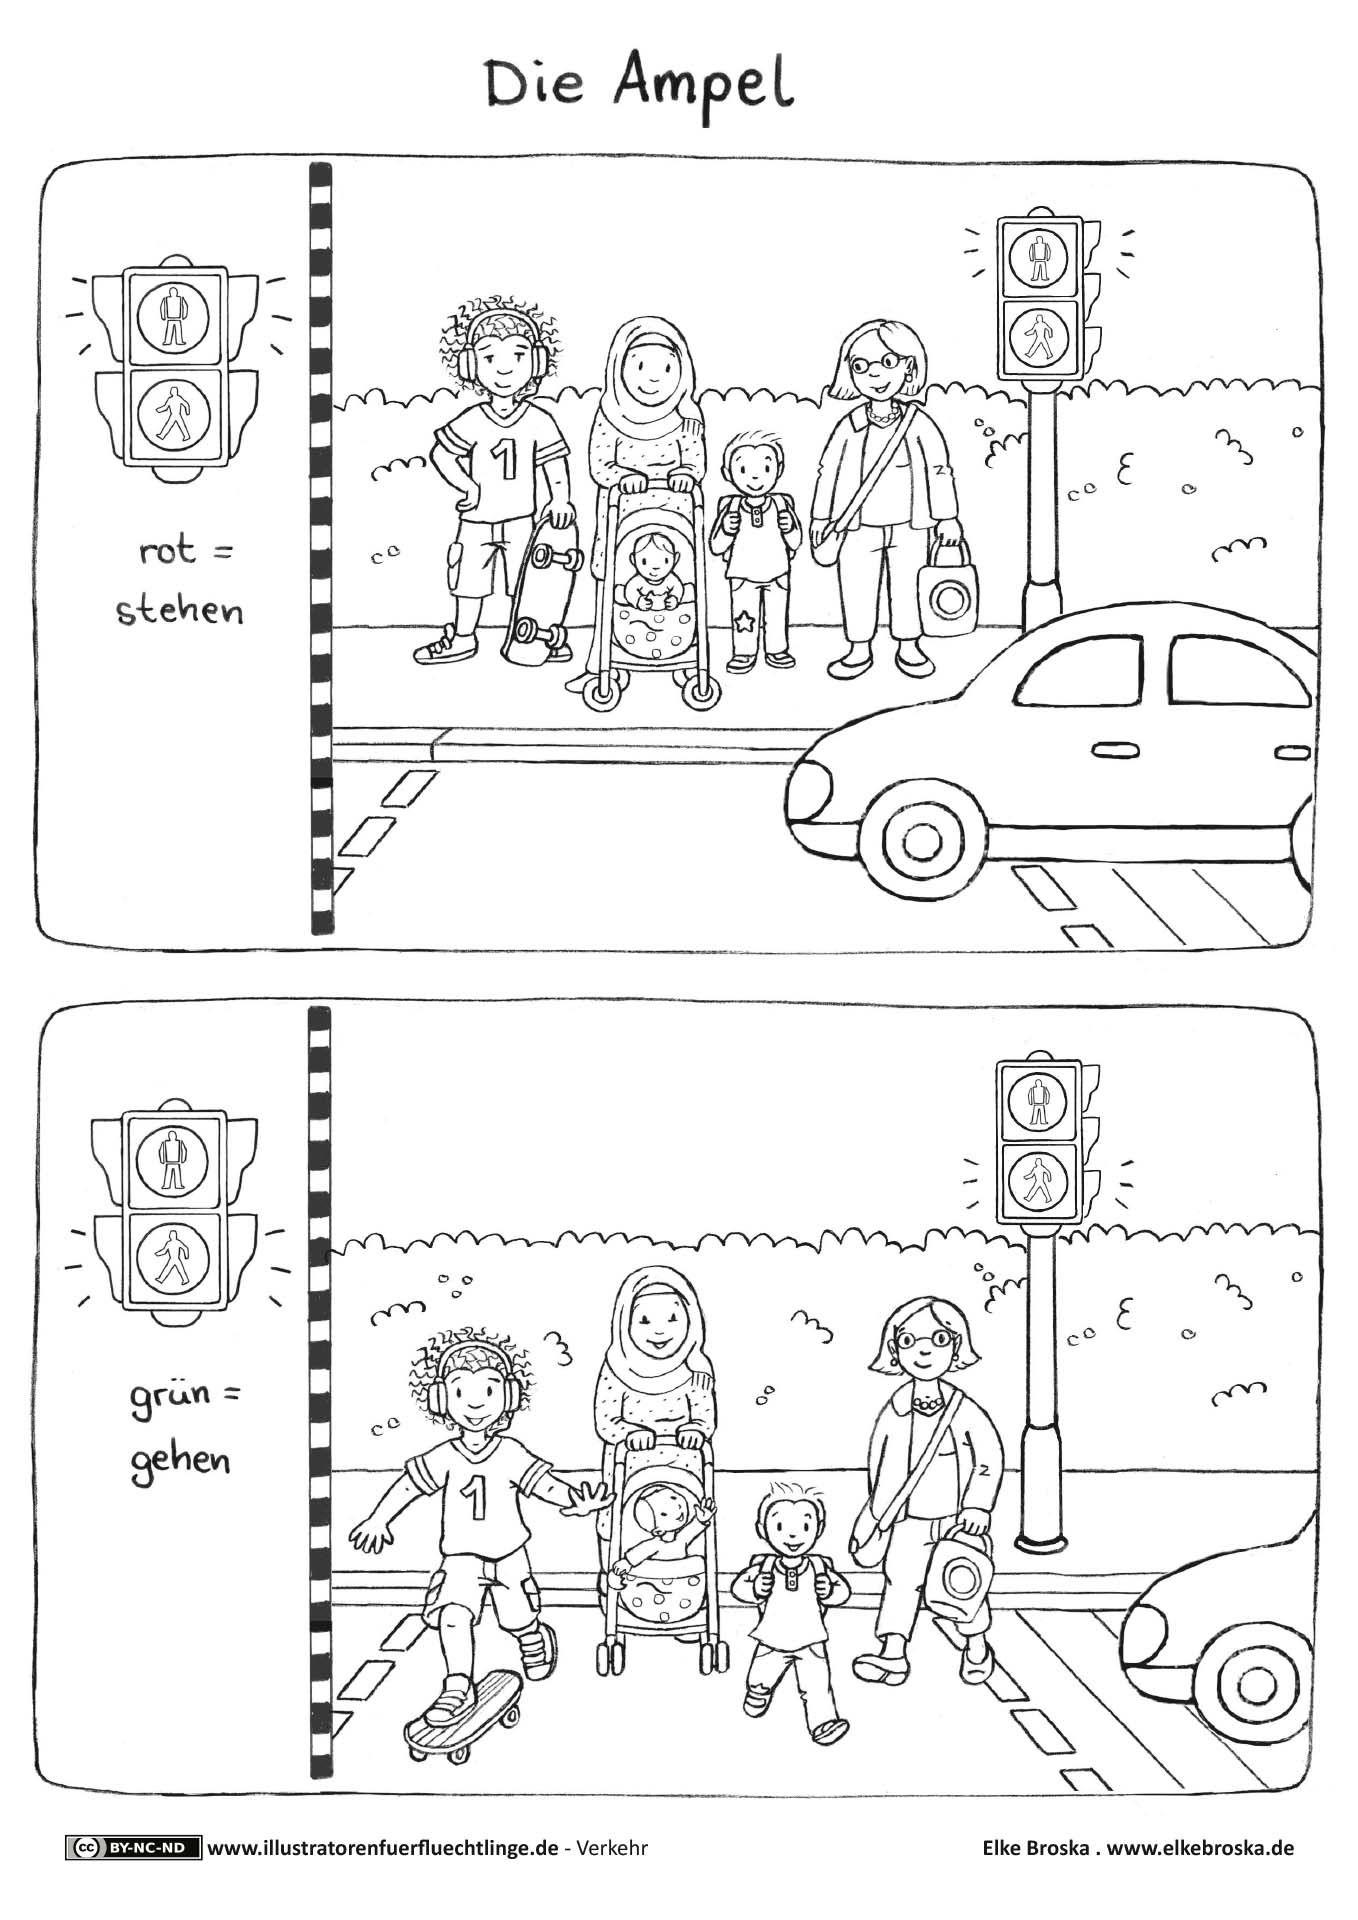 Download Als Verkehr Ampel Broska